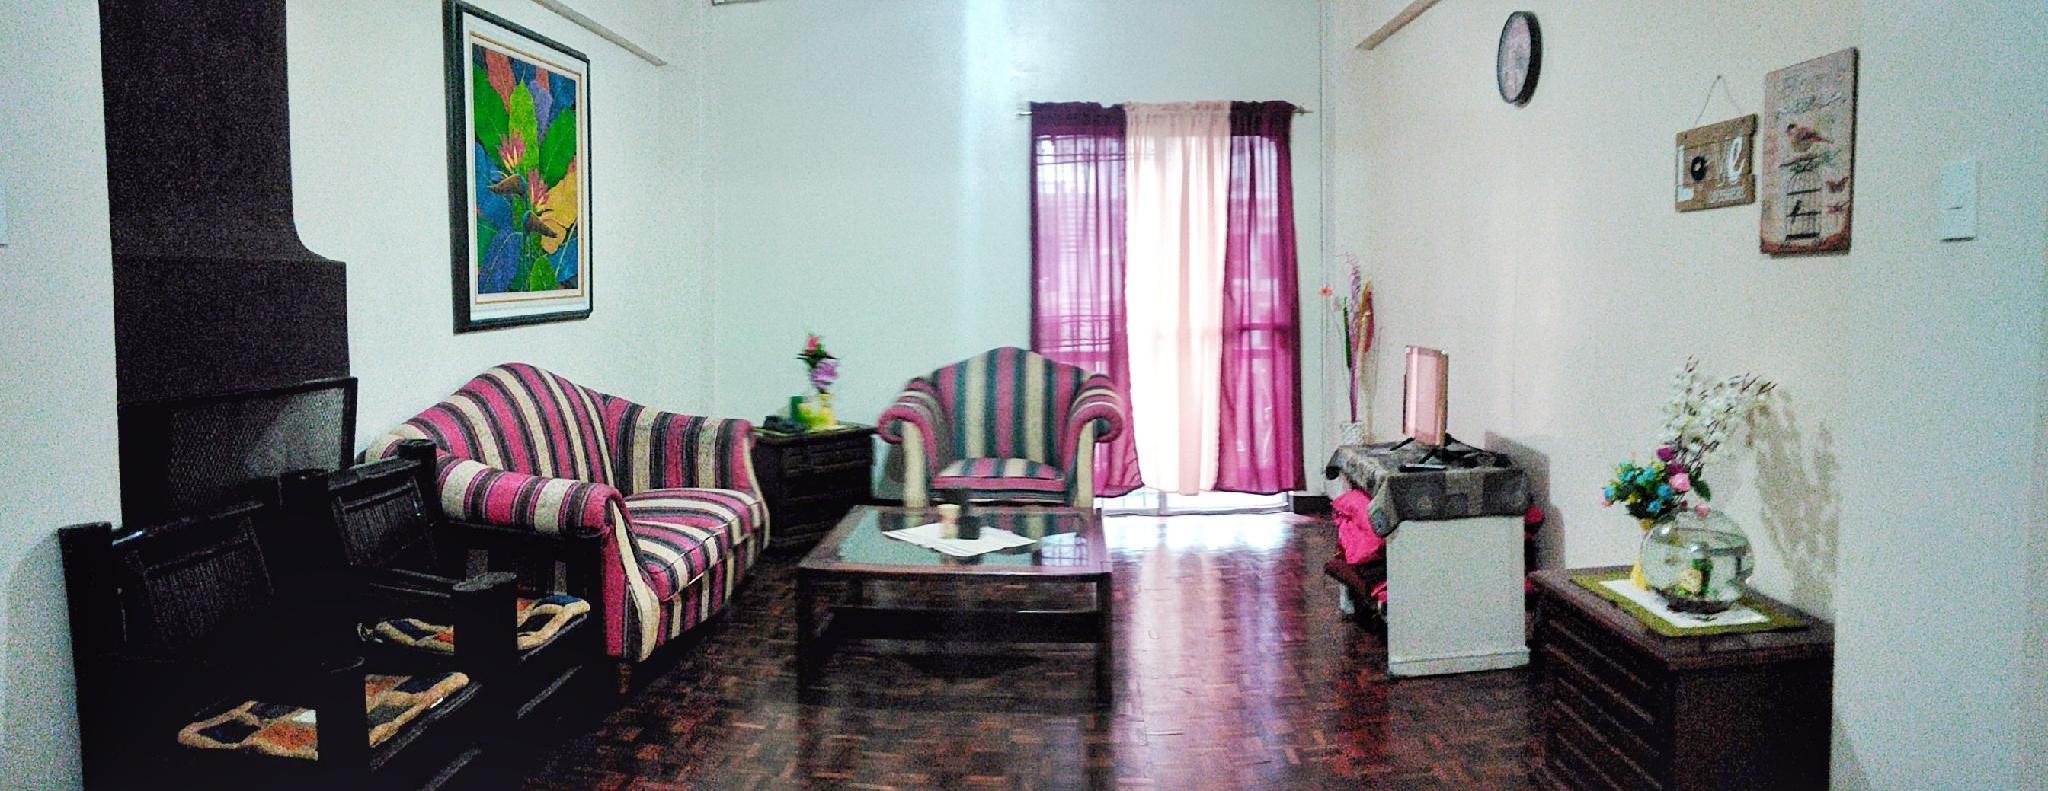 TRIPLE BEDROOM HOUSE NEAR TO MAJOR TOURIST SPOTS